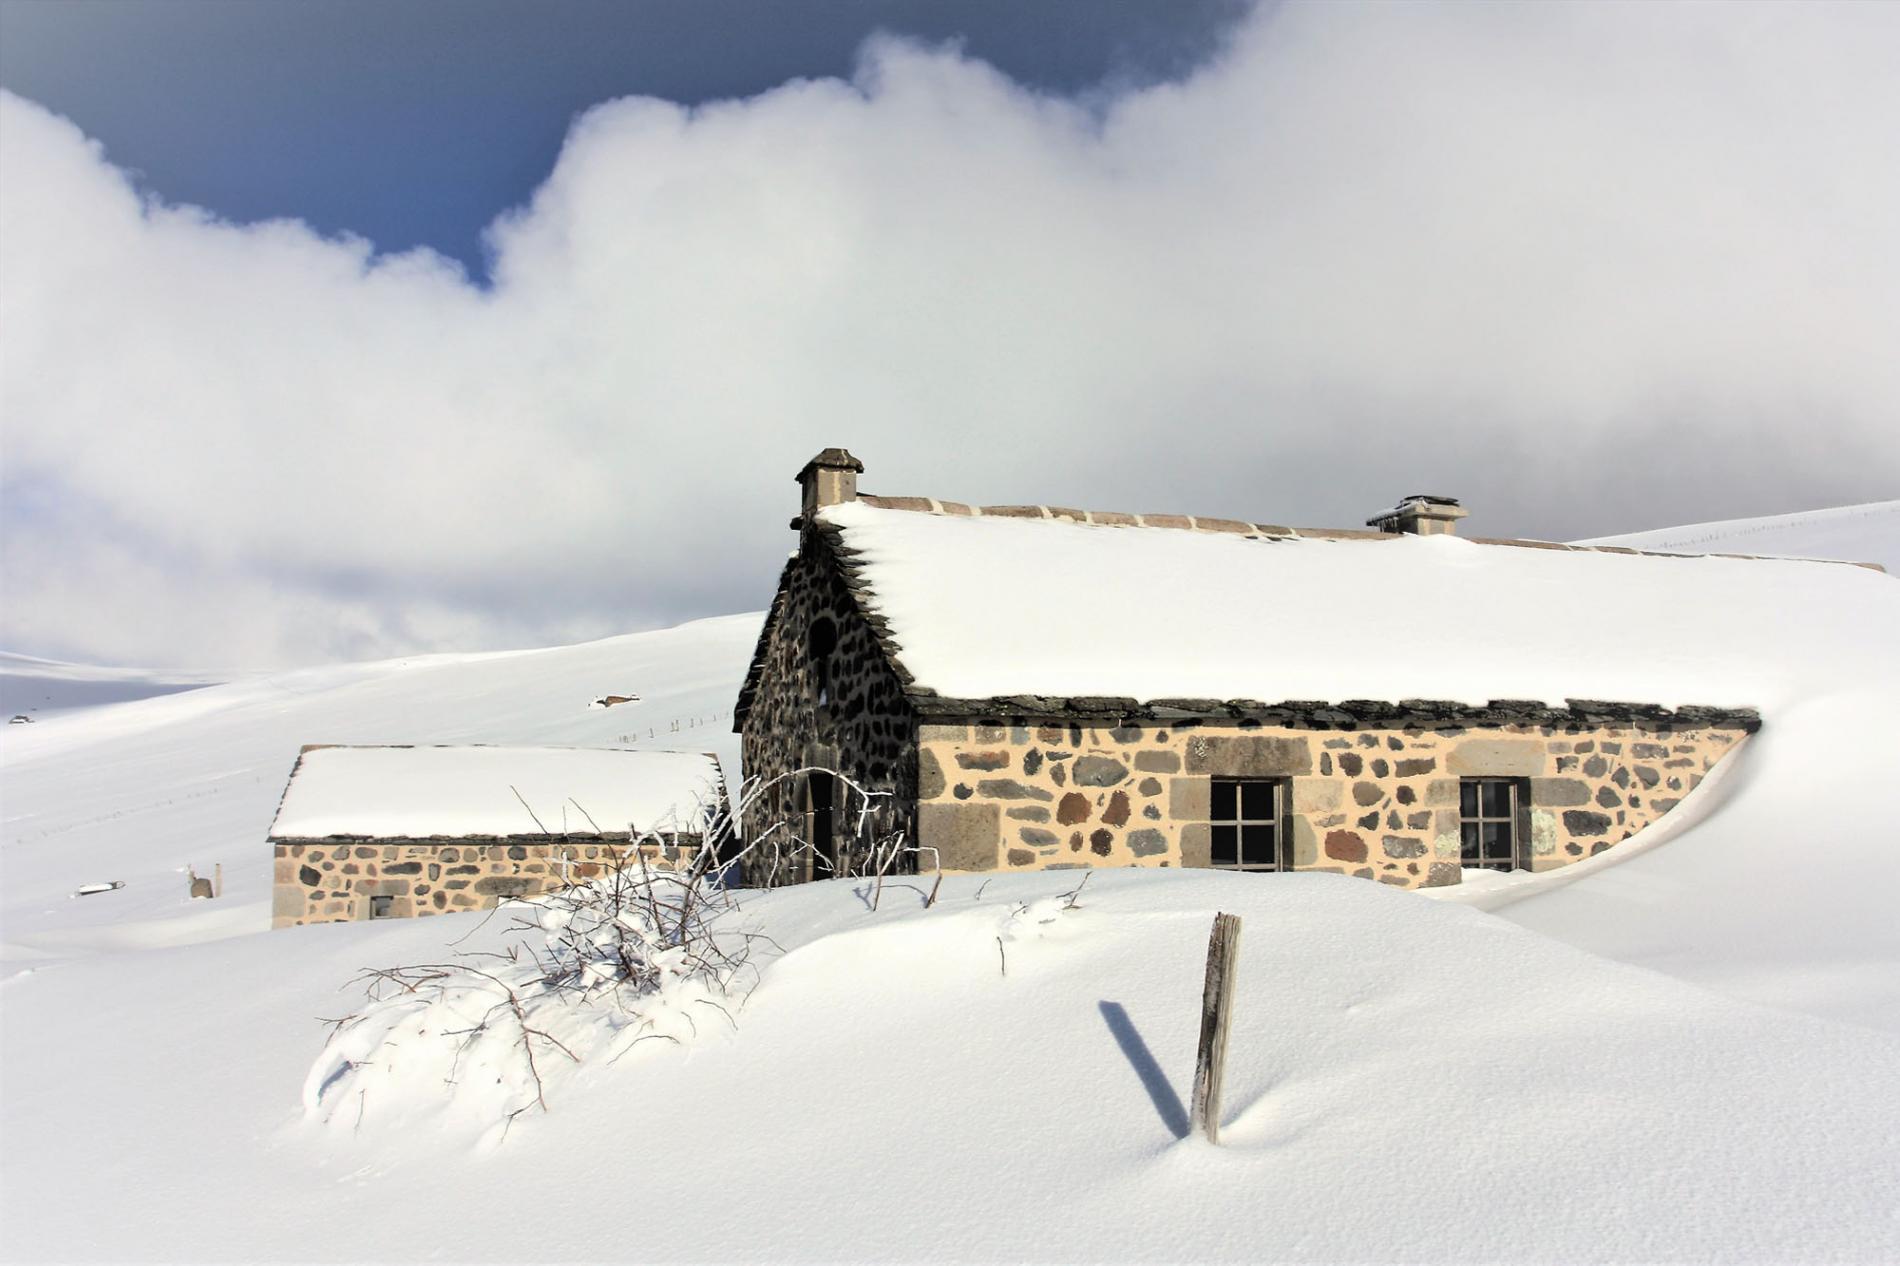 Le buron de Bâne en hiver